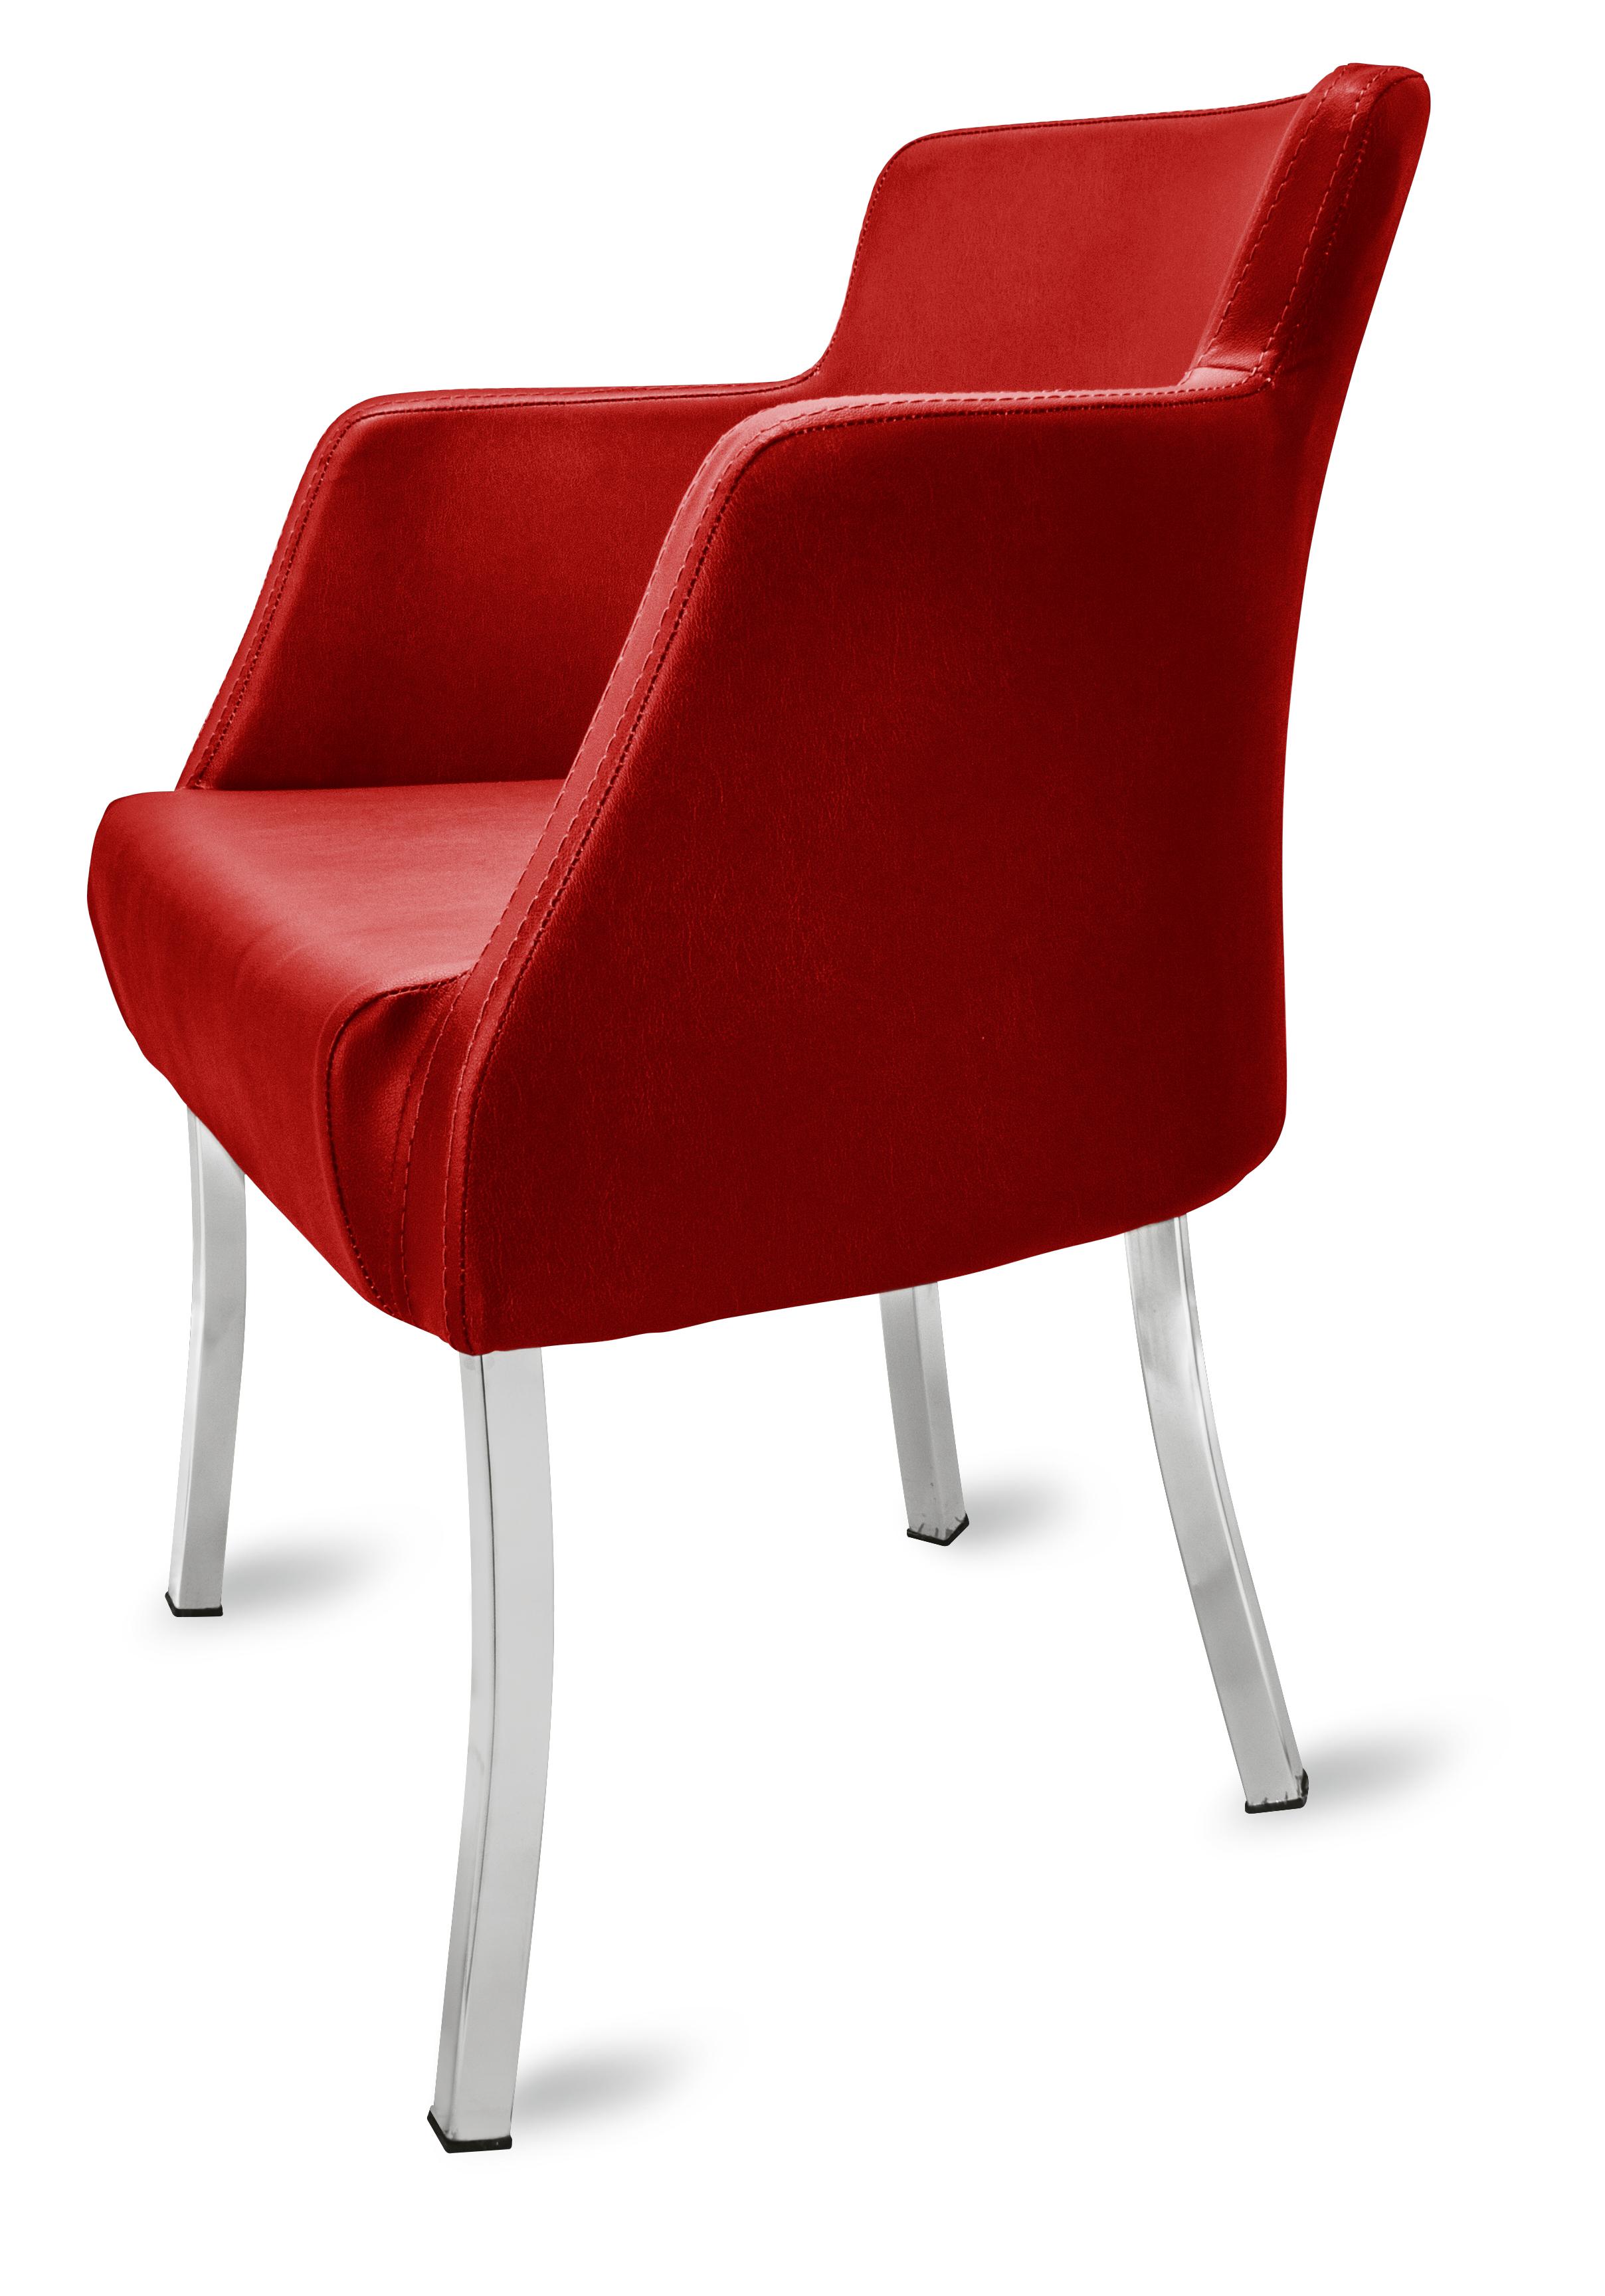 sessel rot, gastro stuhl sessel primo rot günstig kaufen | möbel star, Design ideen